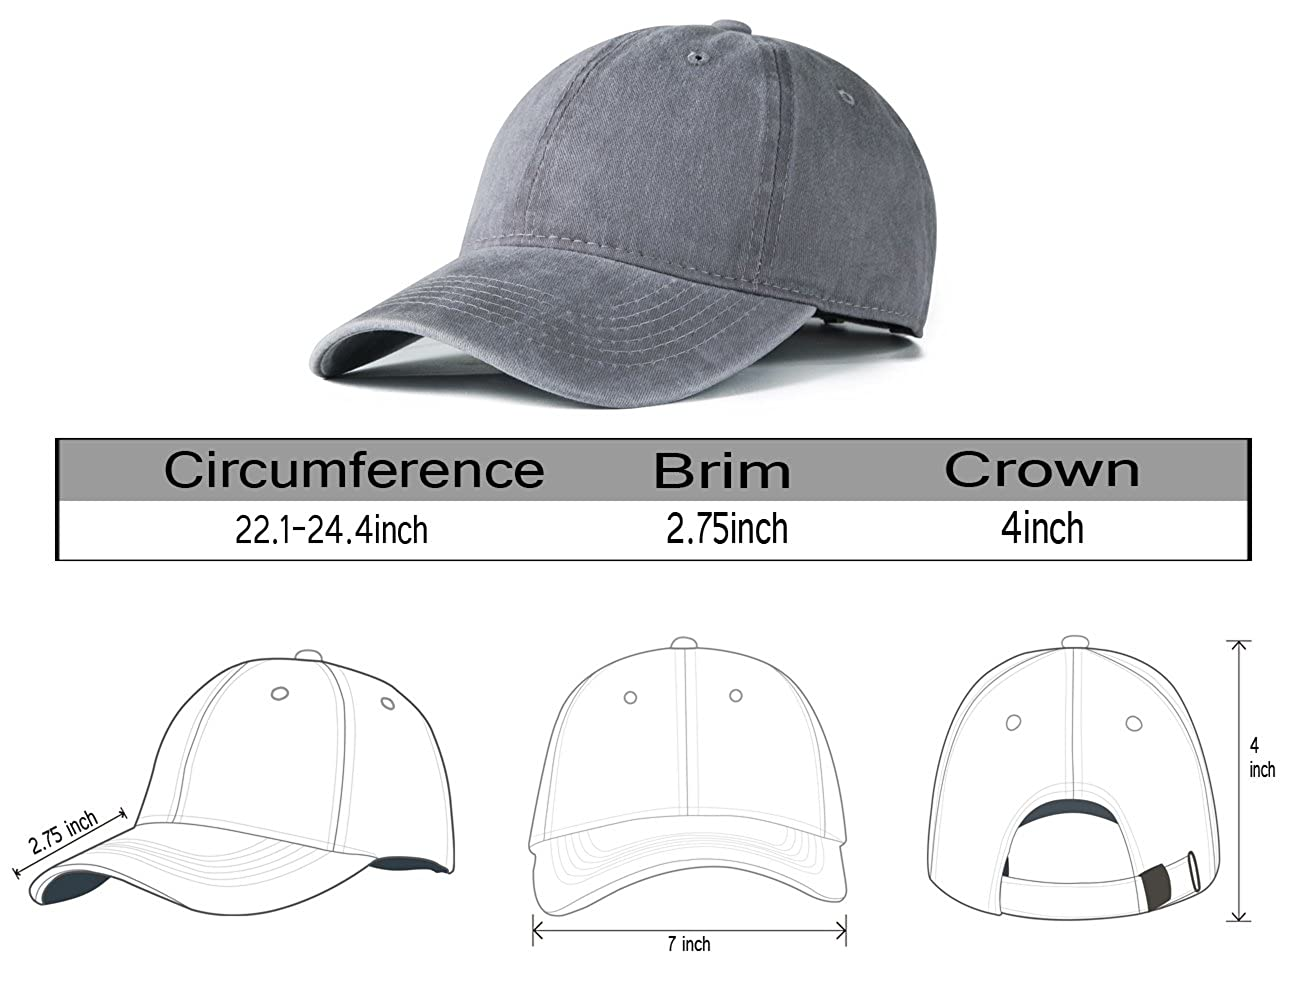 88f86fa8b03 Edoneery Men Women Cotton Adjustable Washed Twill Low Profile Plain Baseball  Cap Hat (Gray) at Amazon Men s Clothing store